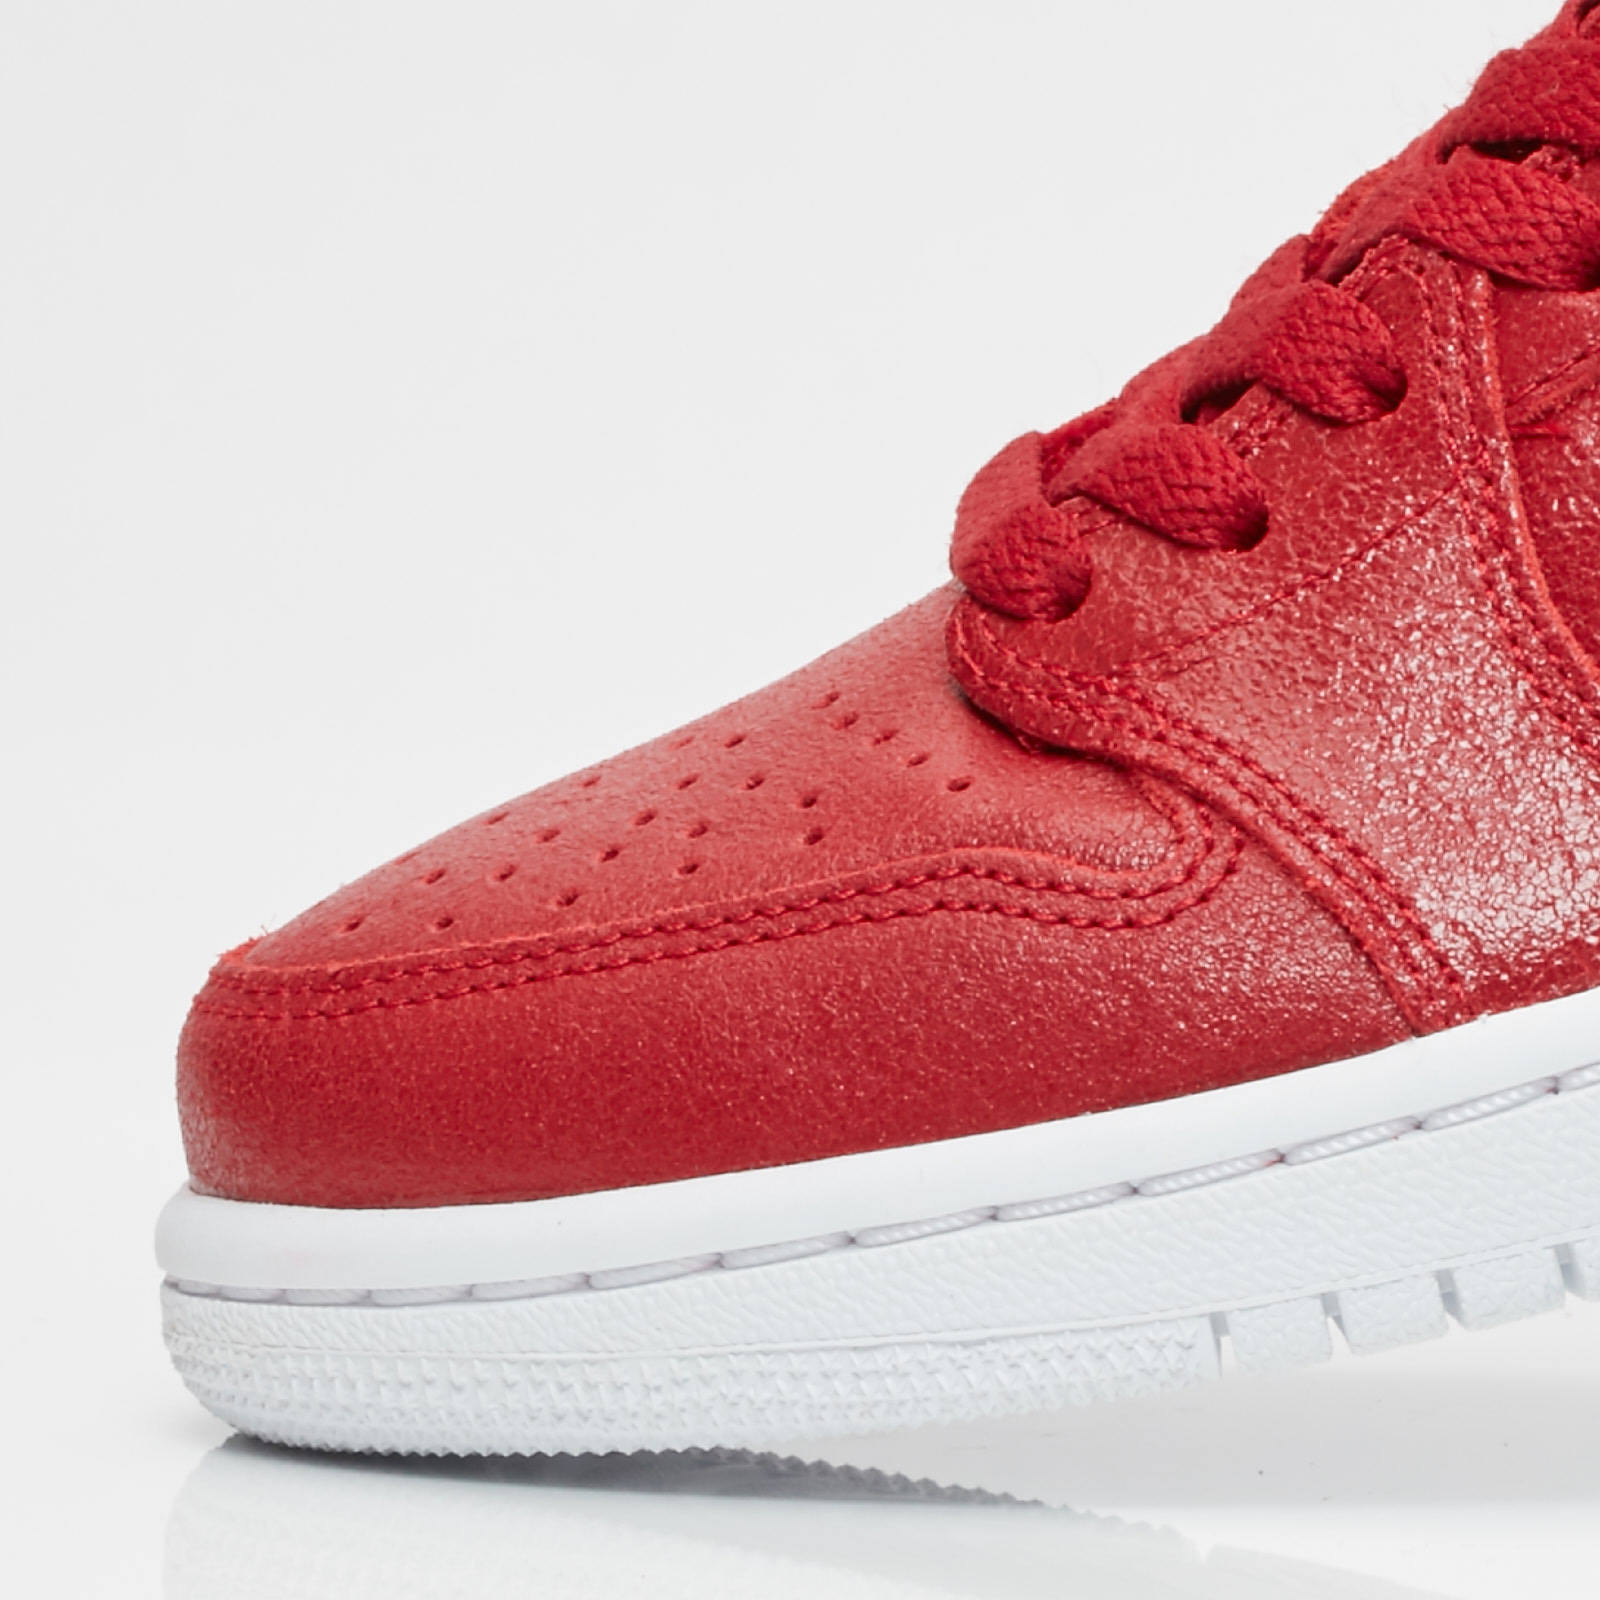 newest 416bd f3dff Jordan Brand Wmns Air Jordan 1 Retro Low NS - Ah7232-623 - Sneakersnstuff    sneakers   streetwear online since 1999